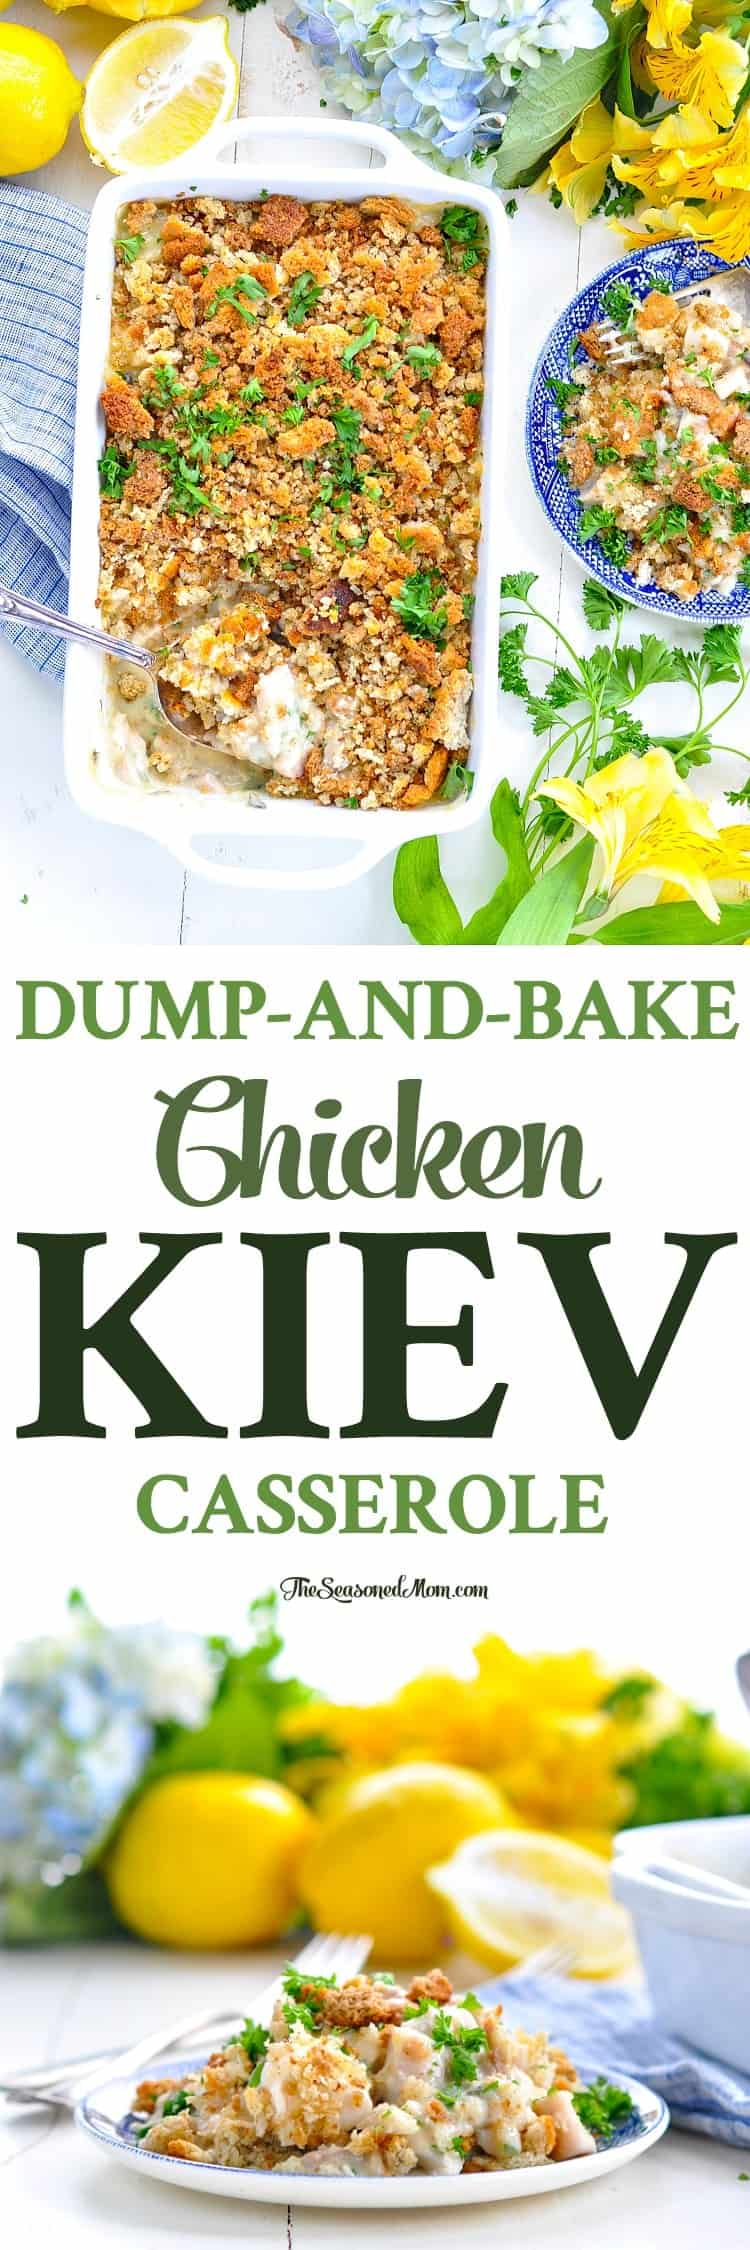 Long vertical image of a Dump-and-Bake Chicken Kiev Casserole